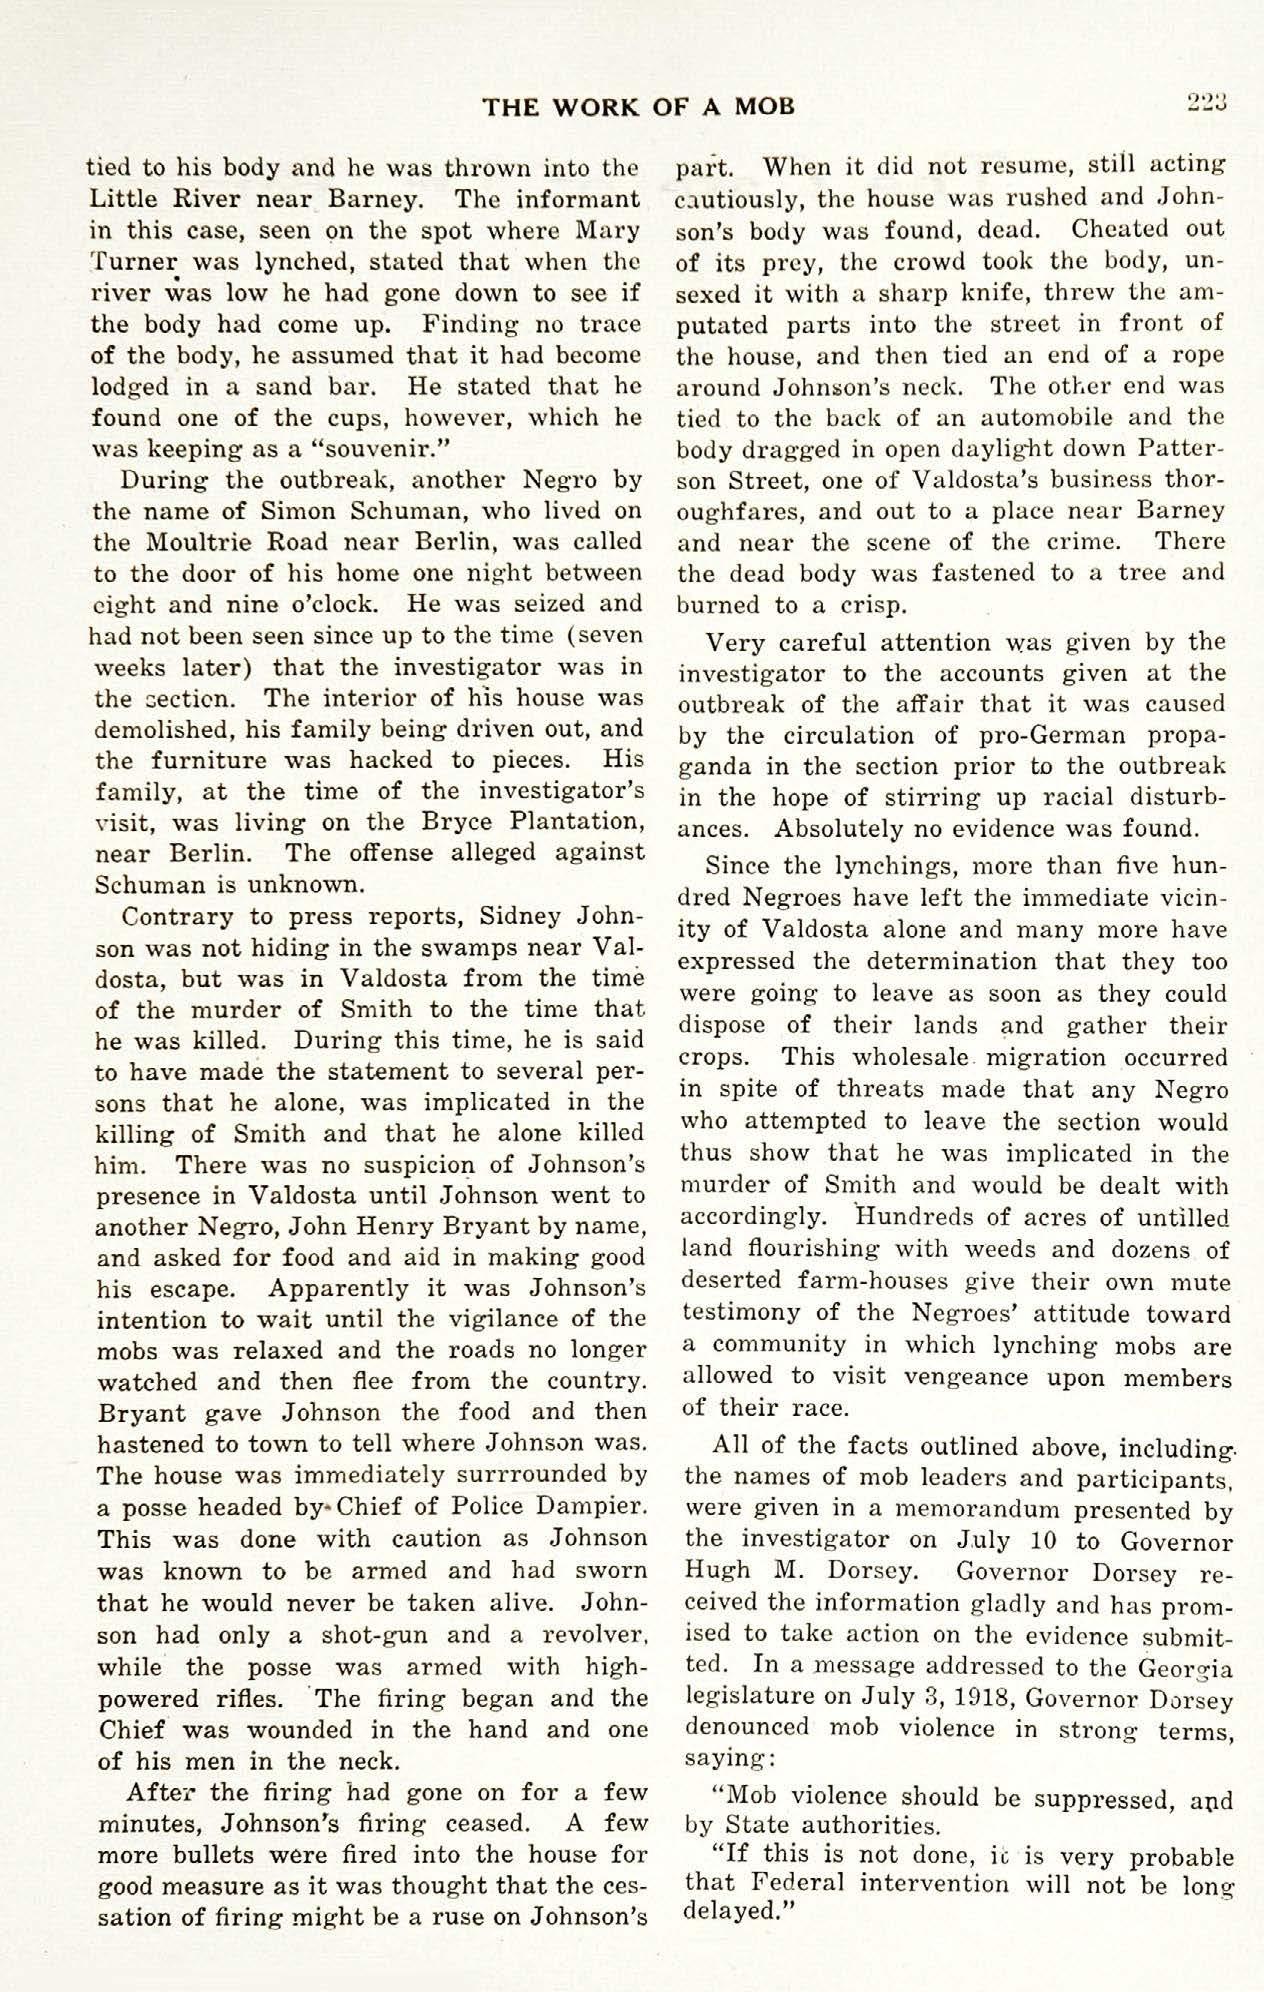 walter_white_mary_turner_1918_Page_3.jpg